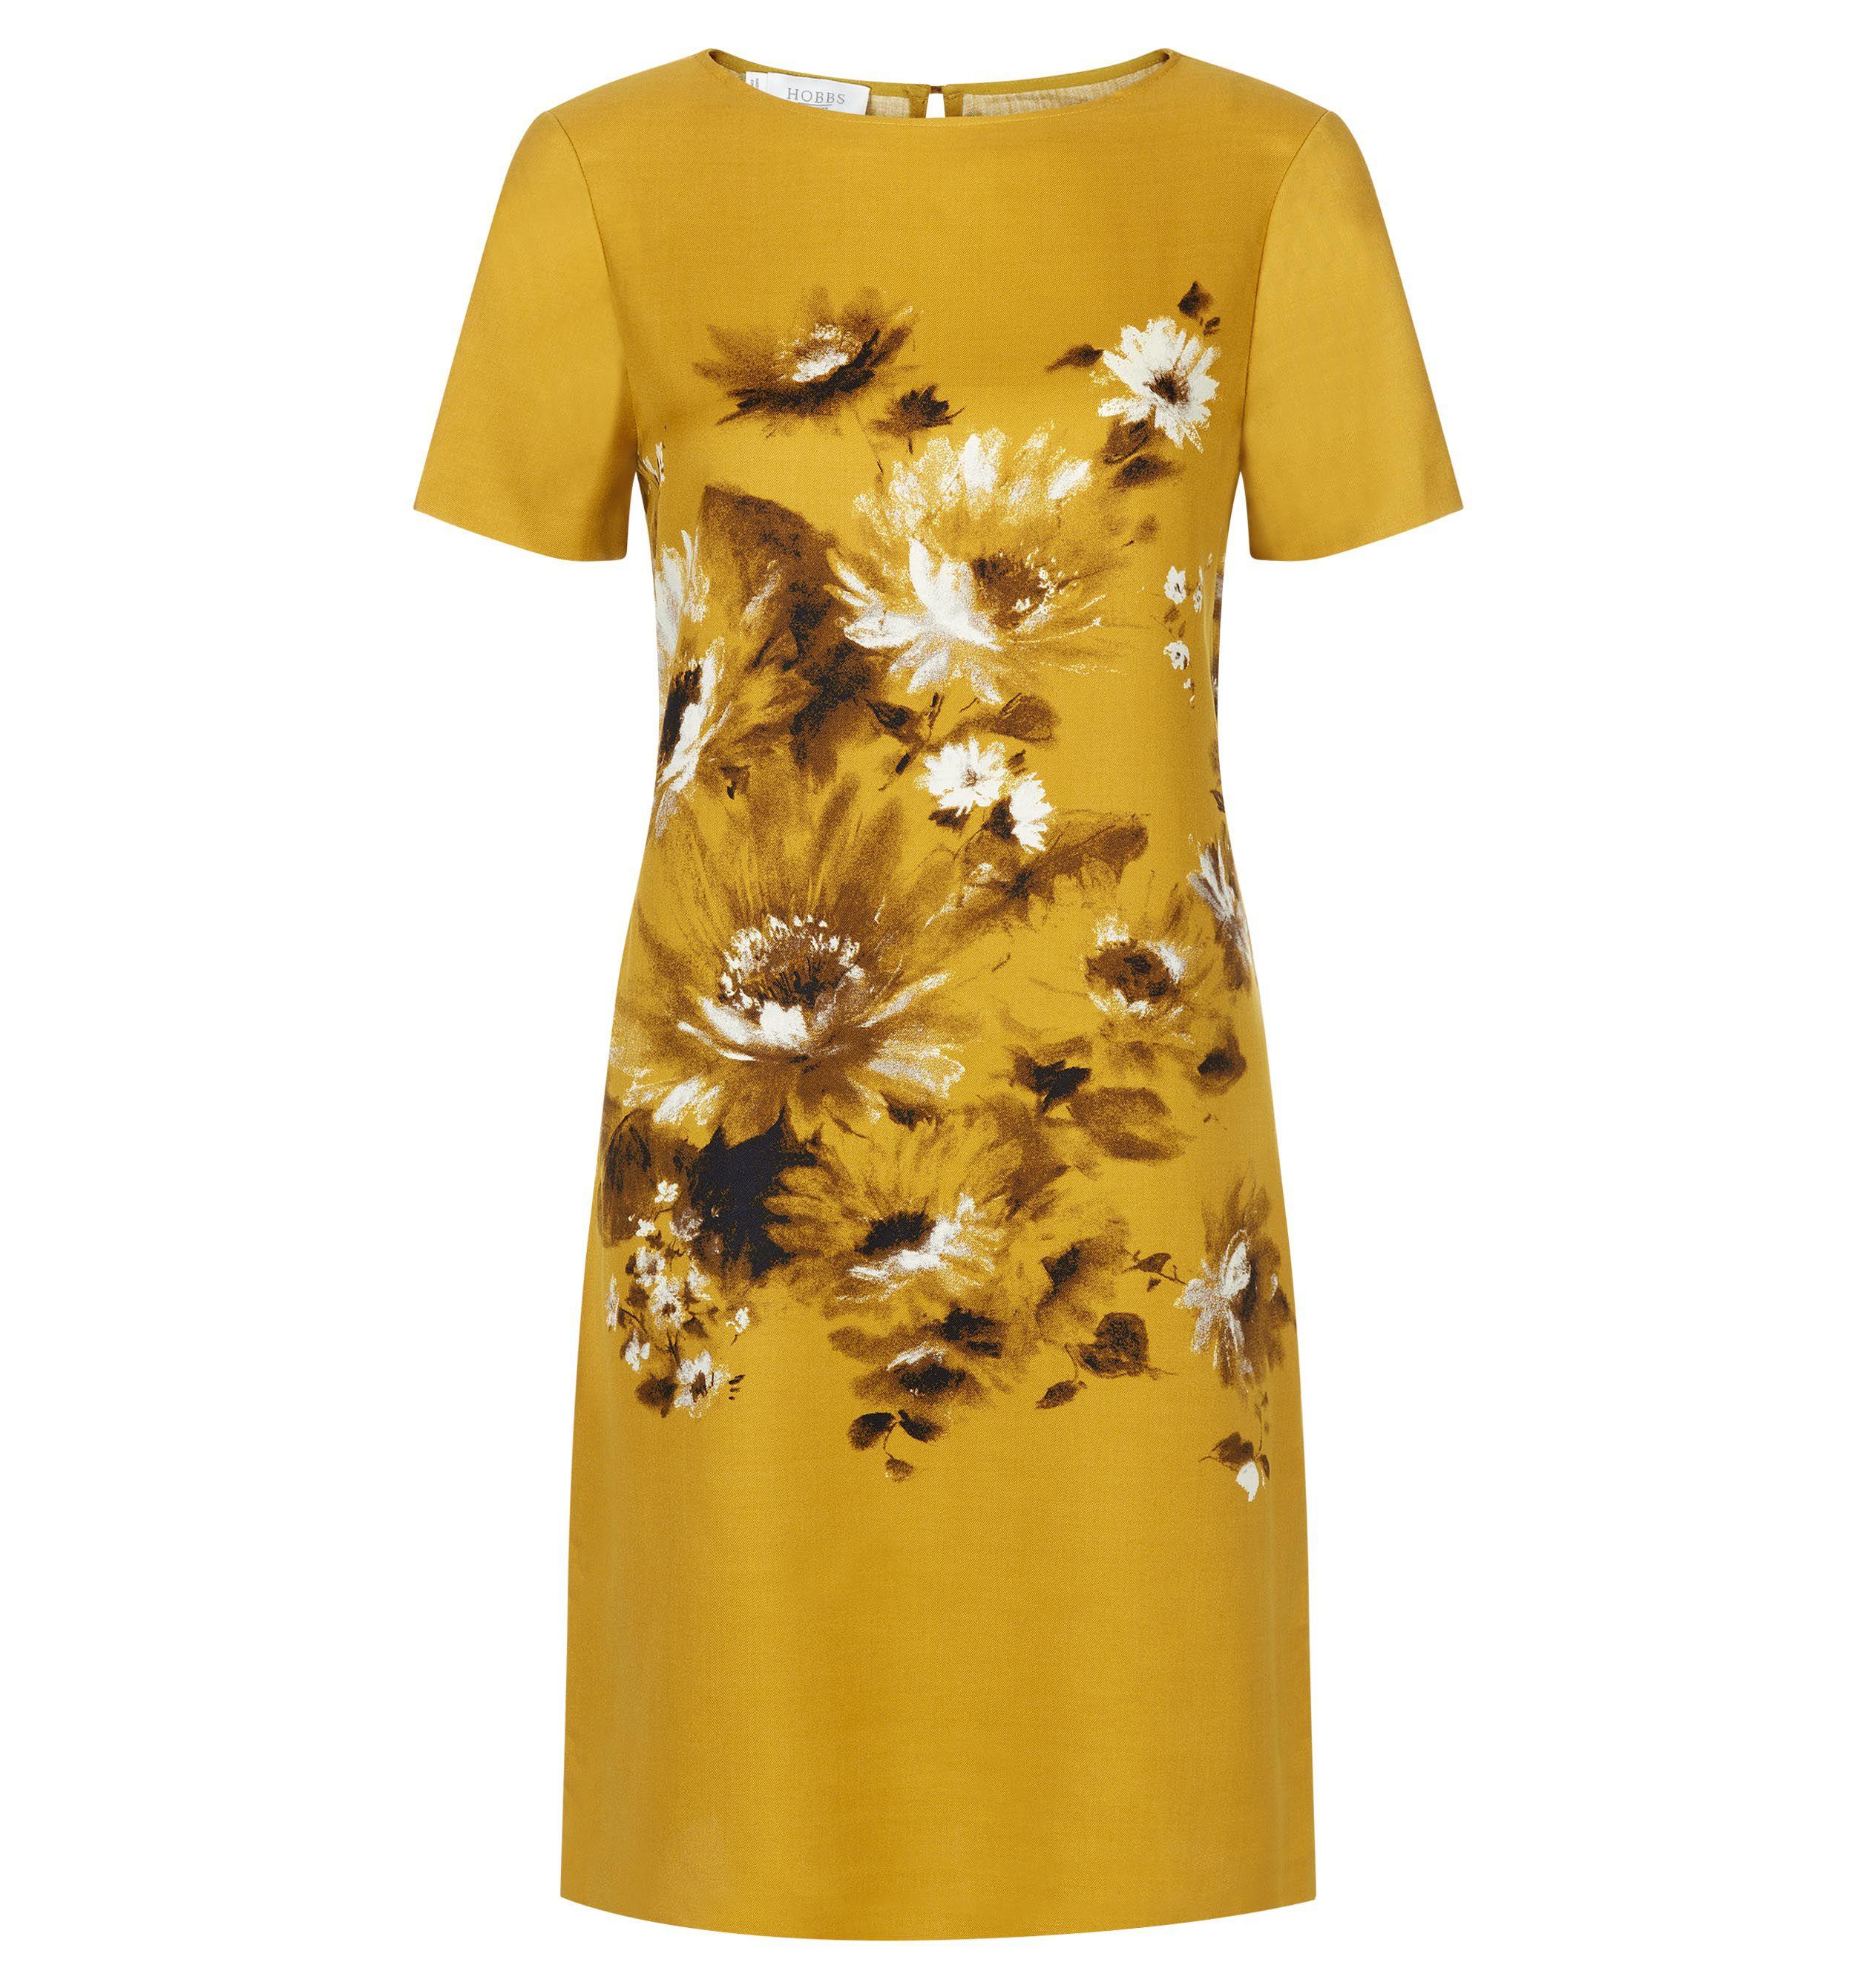 Hobbs Summer Bouquet Dress In Floral Yellow Lyst